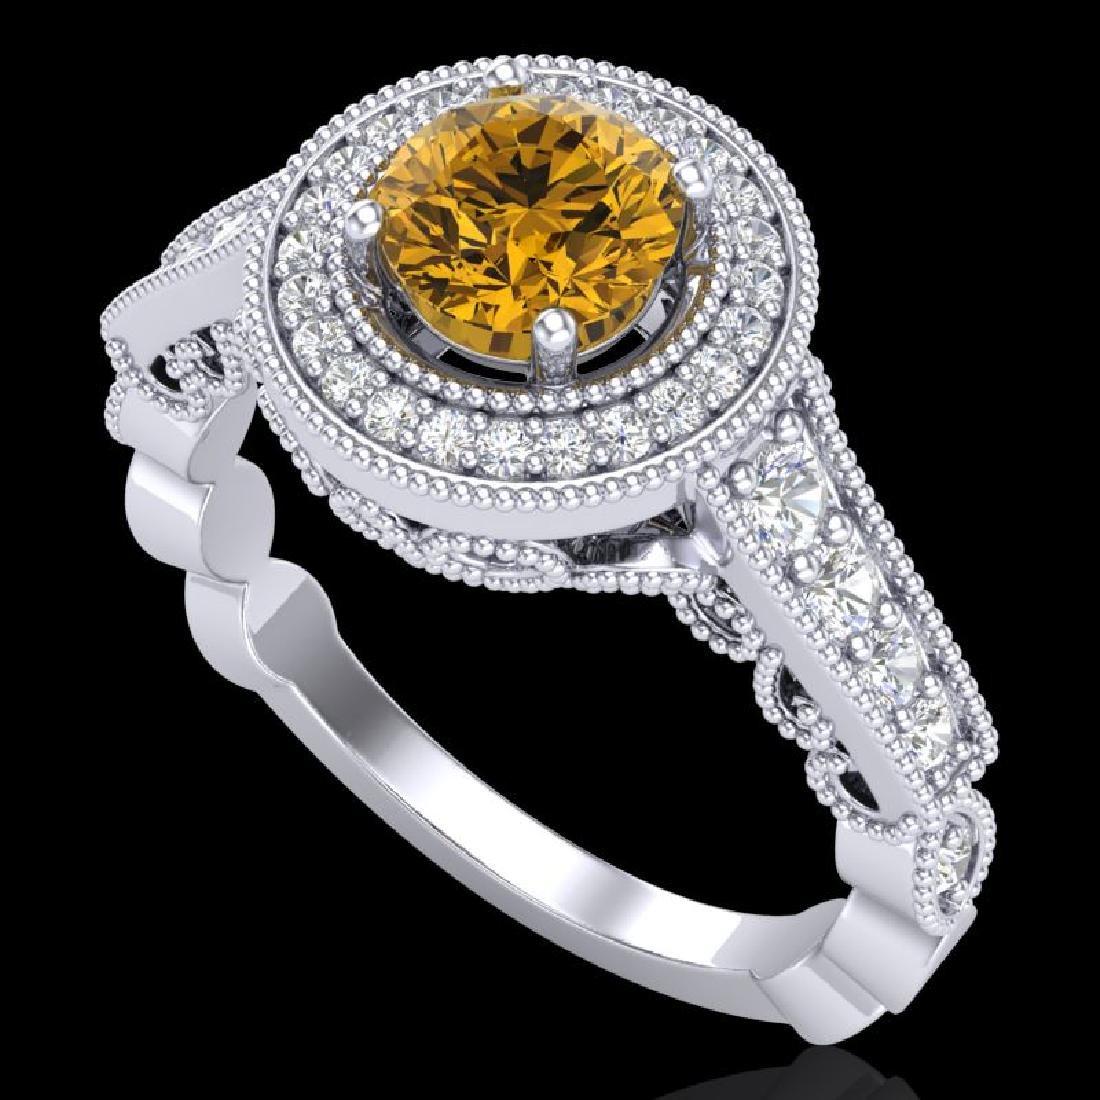 1.12 CTW Intense Fancy Yellow Diamond Engagement Art